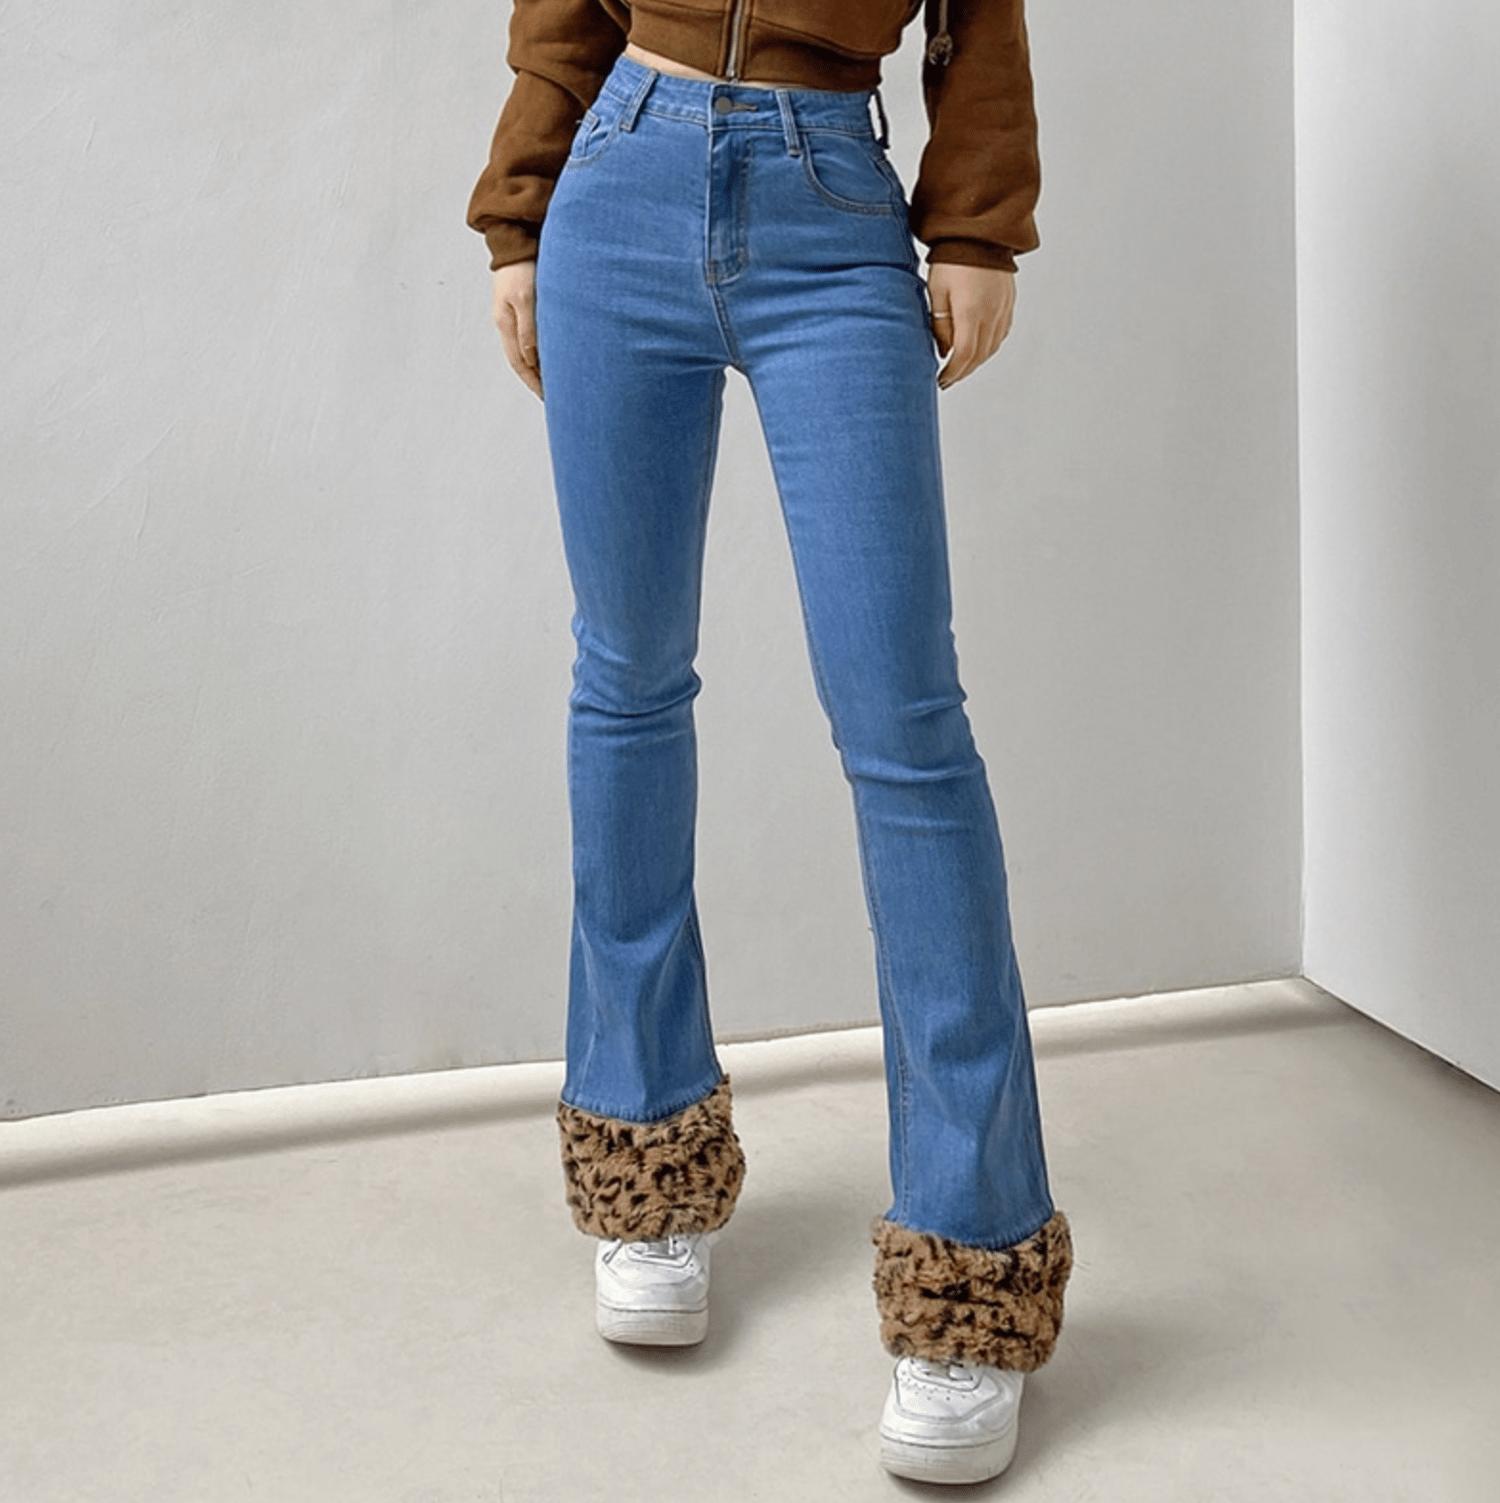 Image of Riley Cheetah Jeans